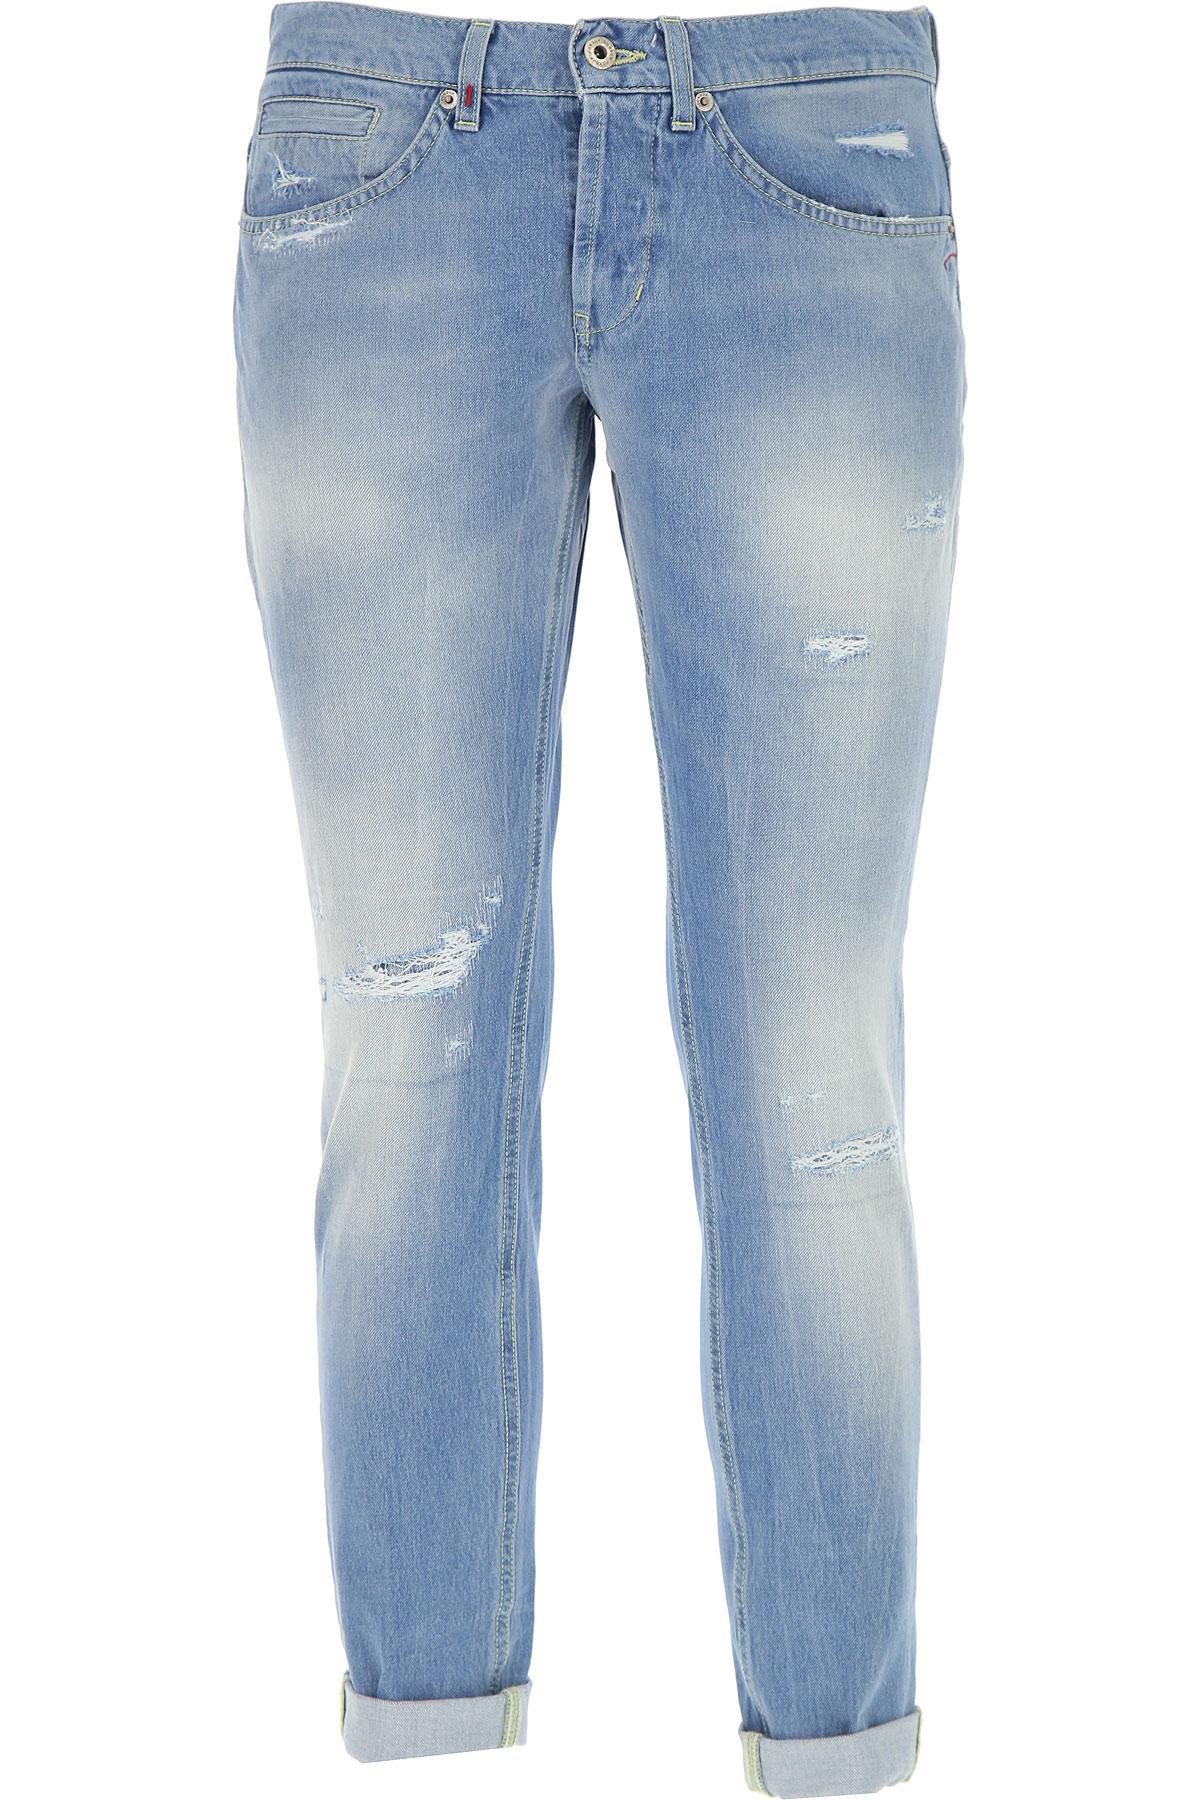 Dondup Jeans On Sale, Light Denim Blue, Cotton, 2017, 32 33 34